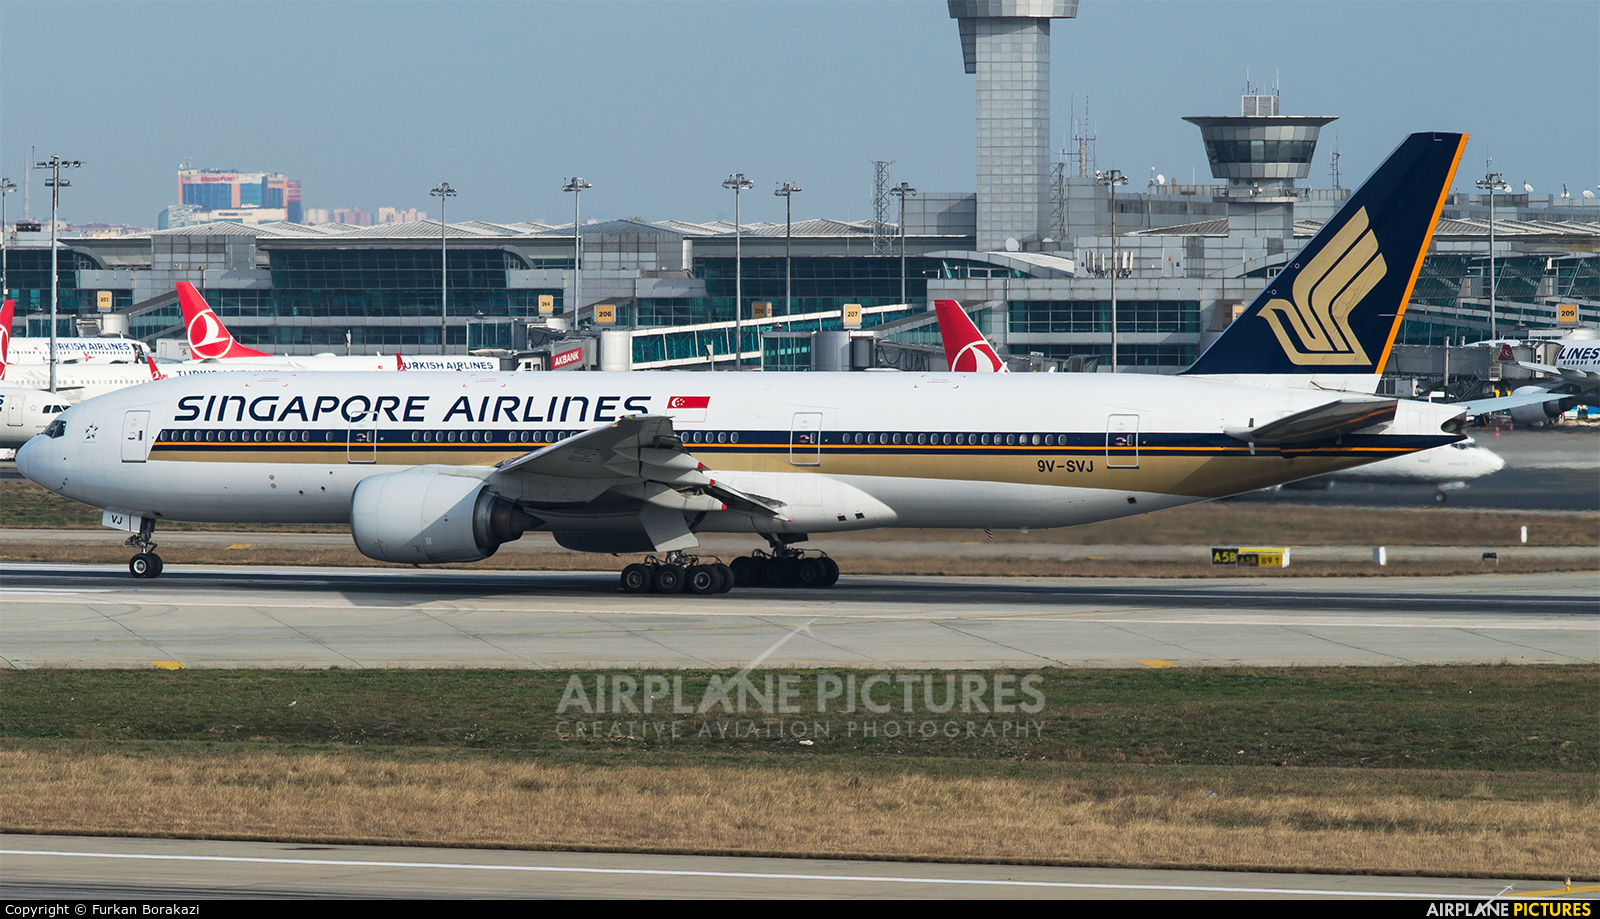 Singapore Airlines 9V-SVJ aircraft at Istanbul - Ataturk